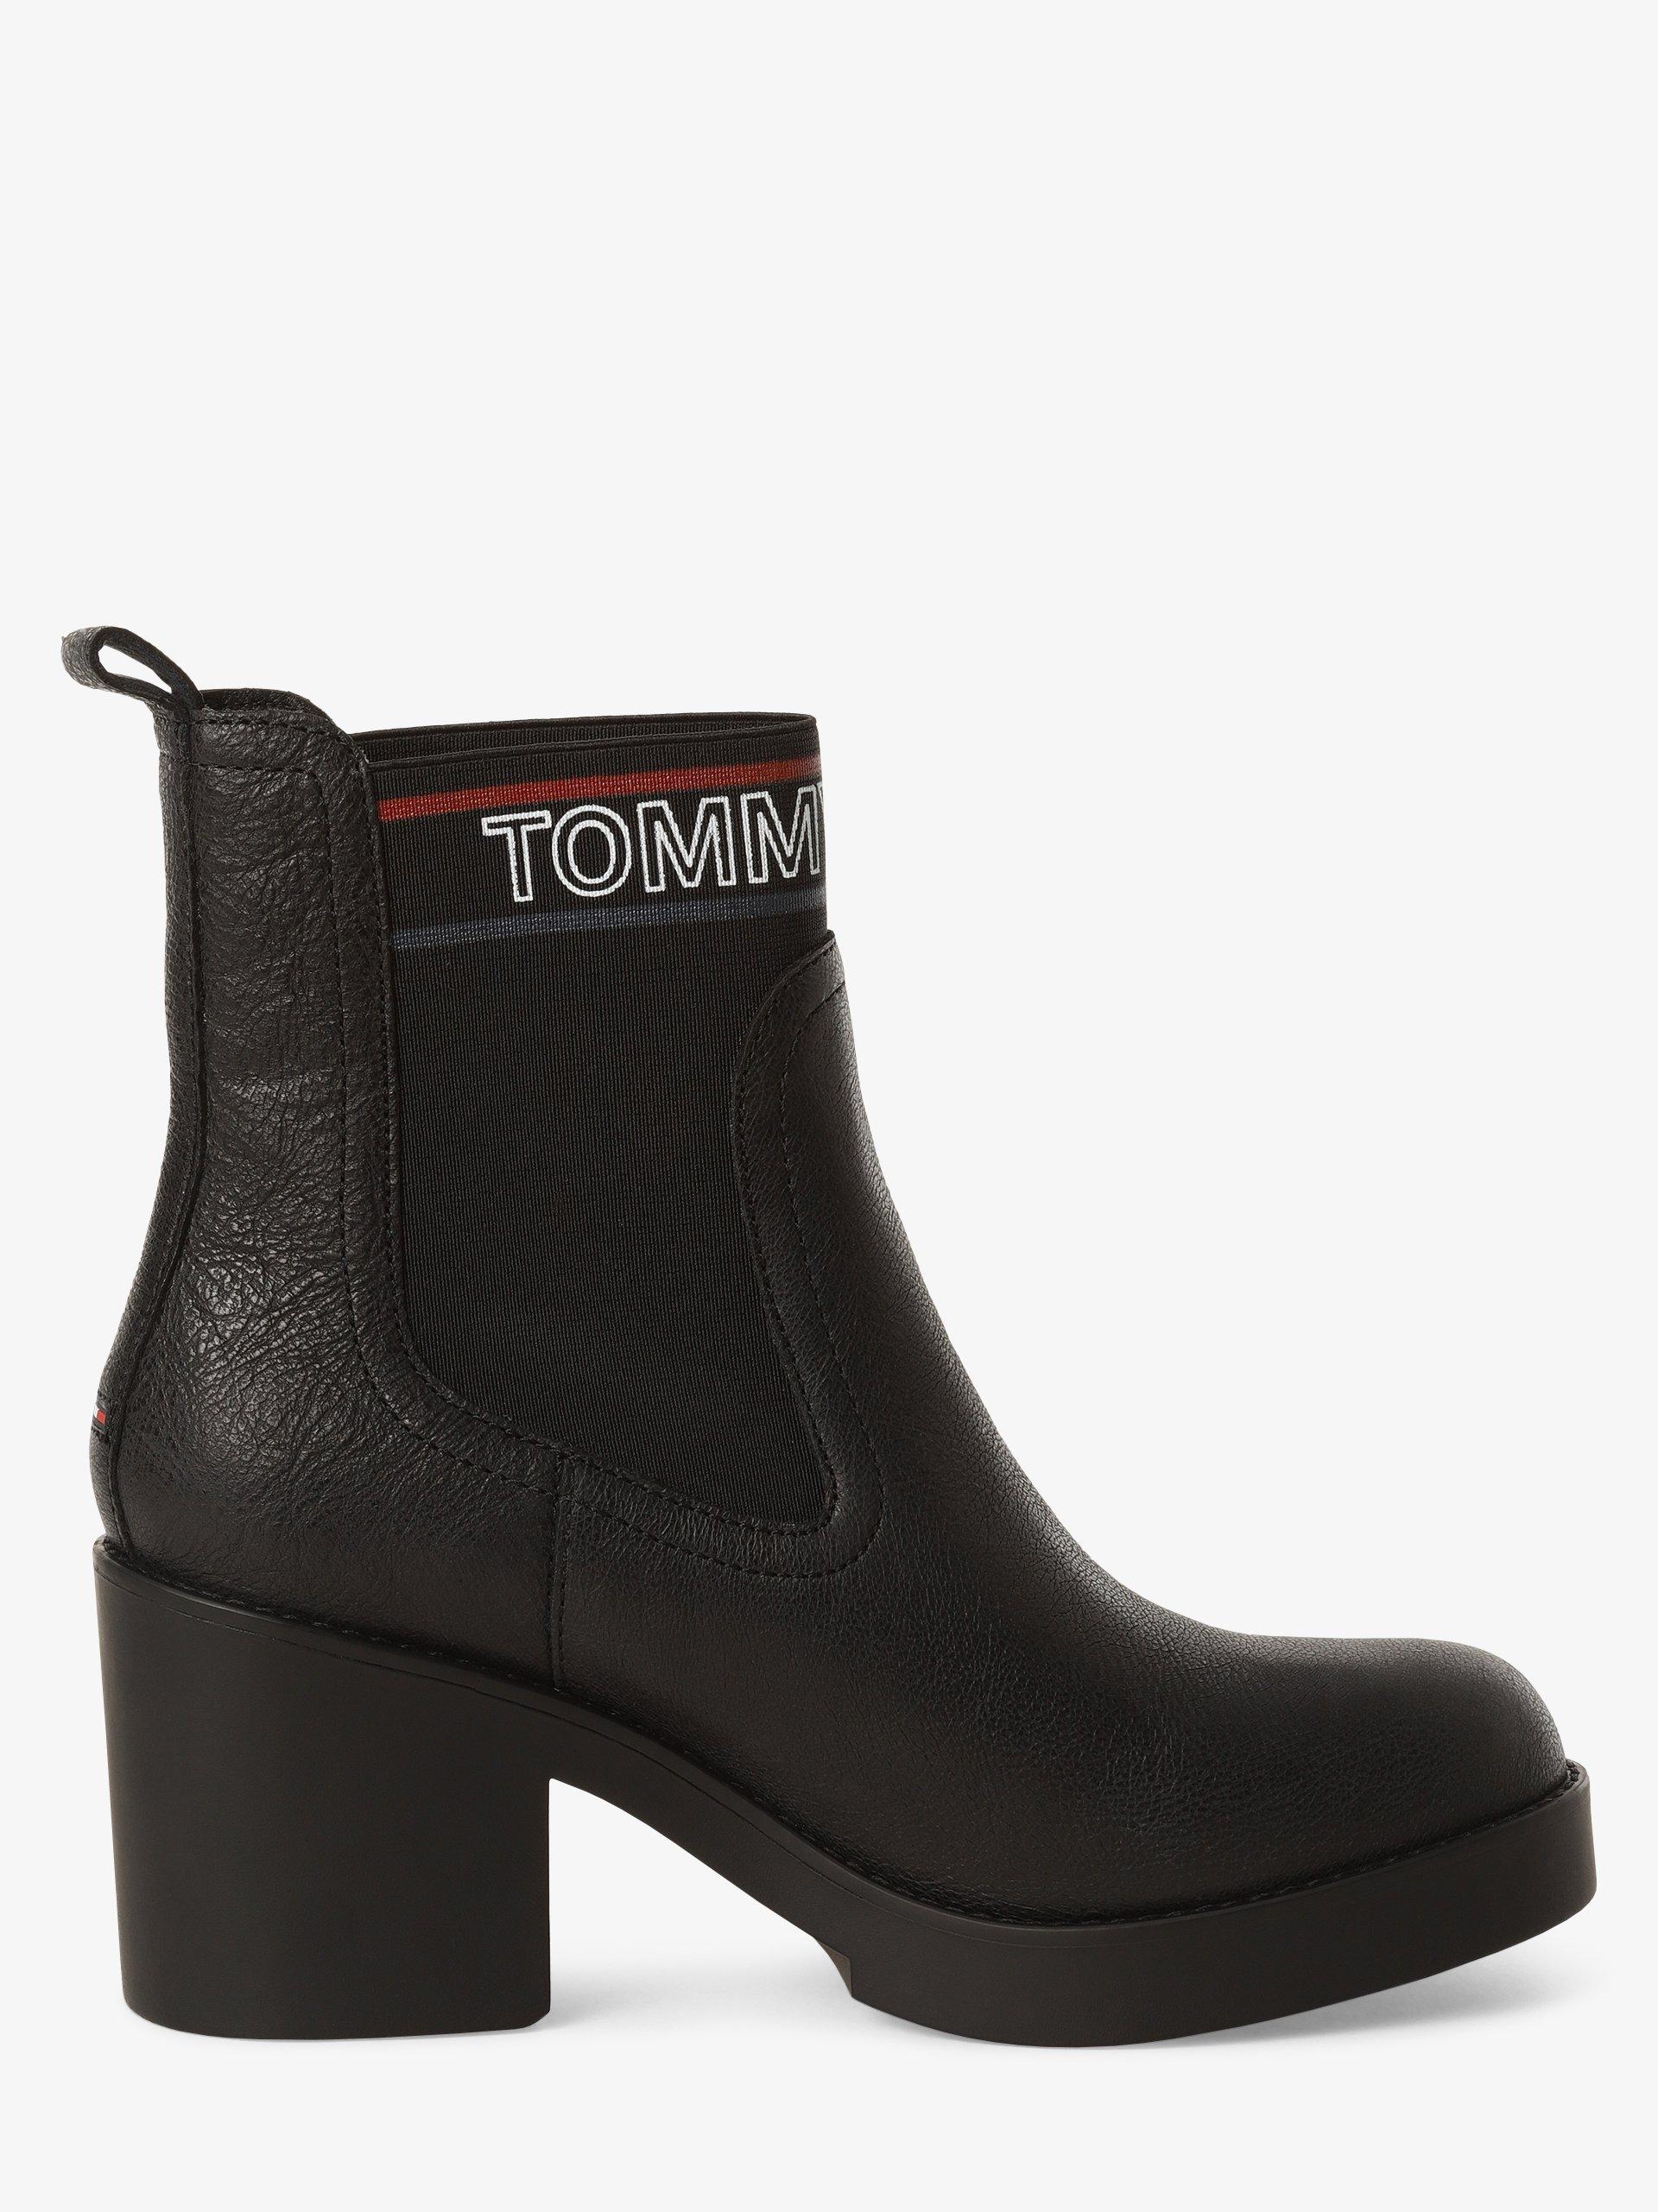 Tommy Jeans Botki damskie z dodatkiem skóry